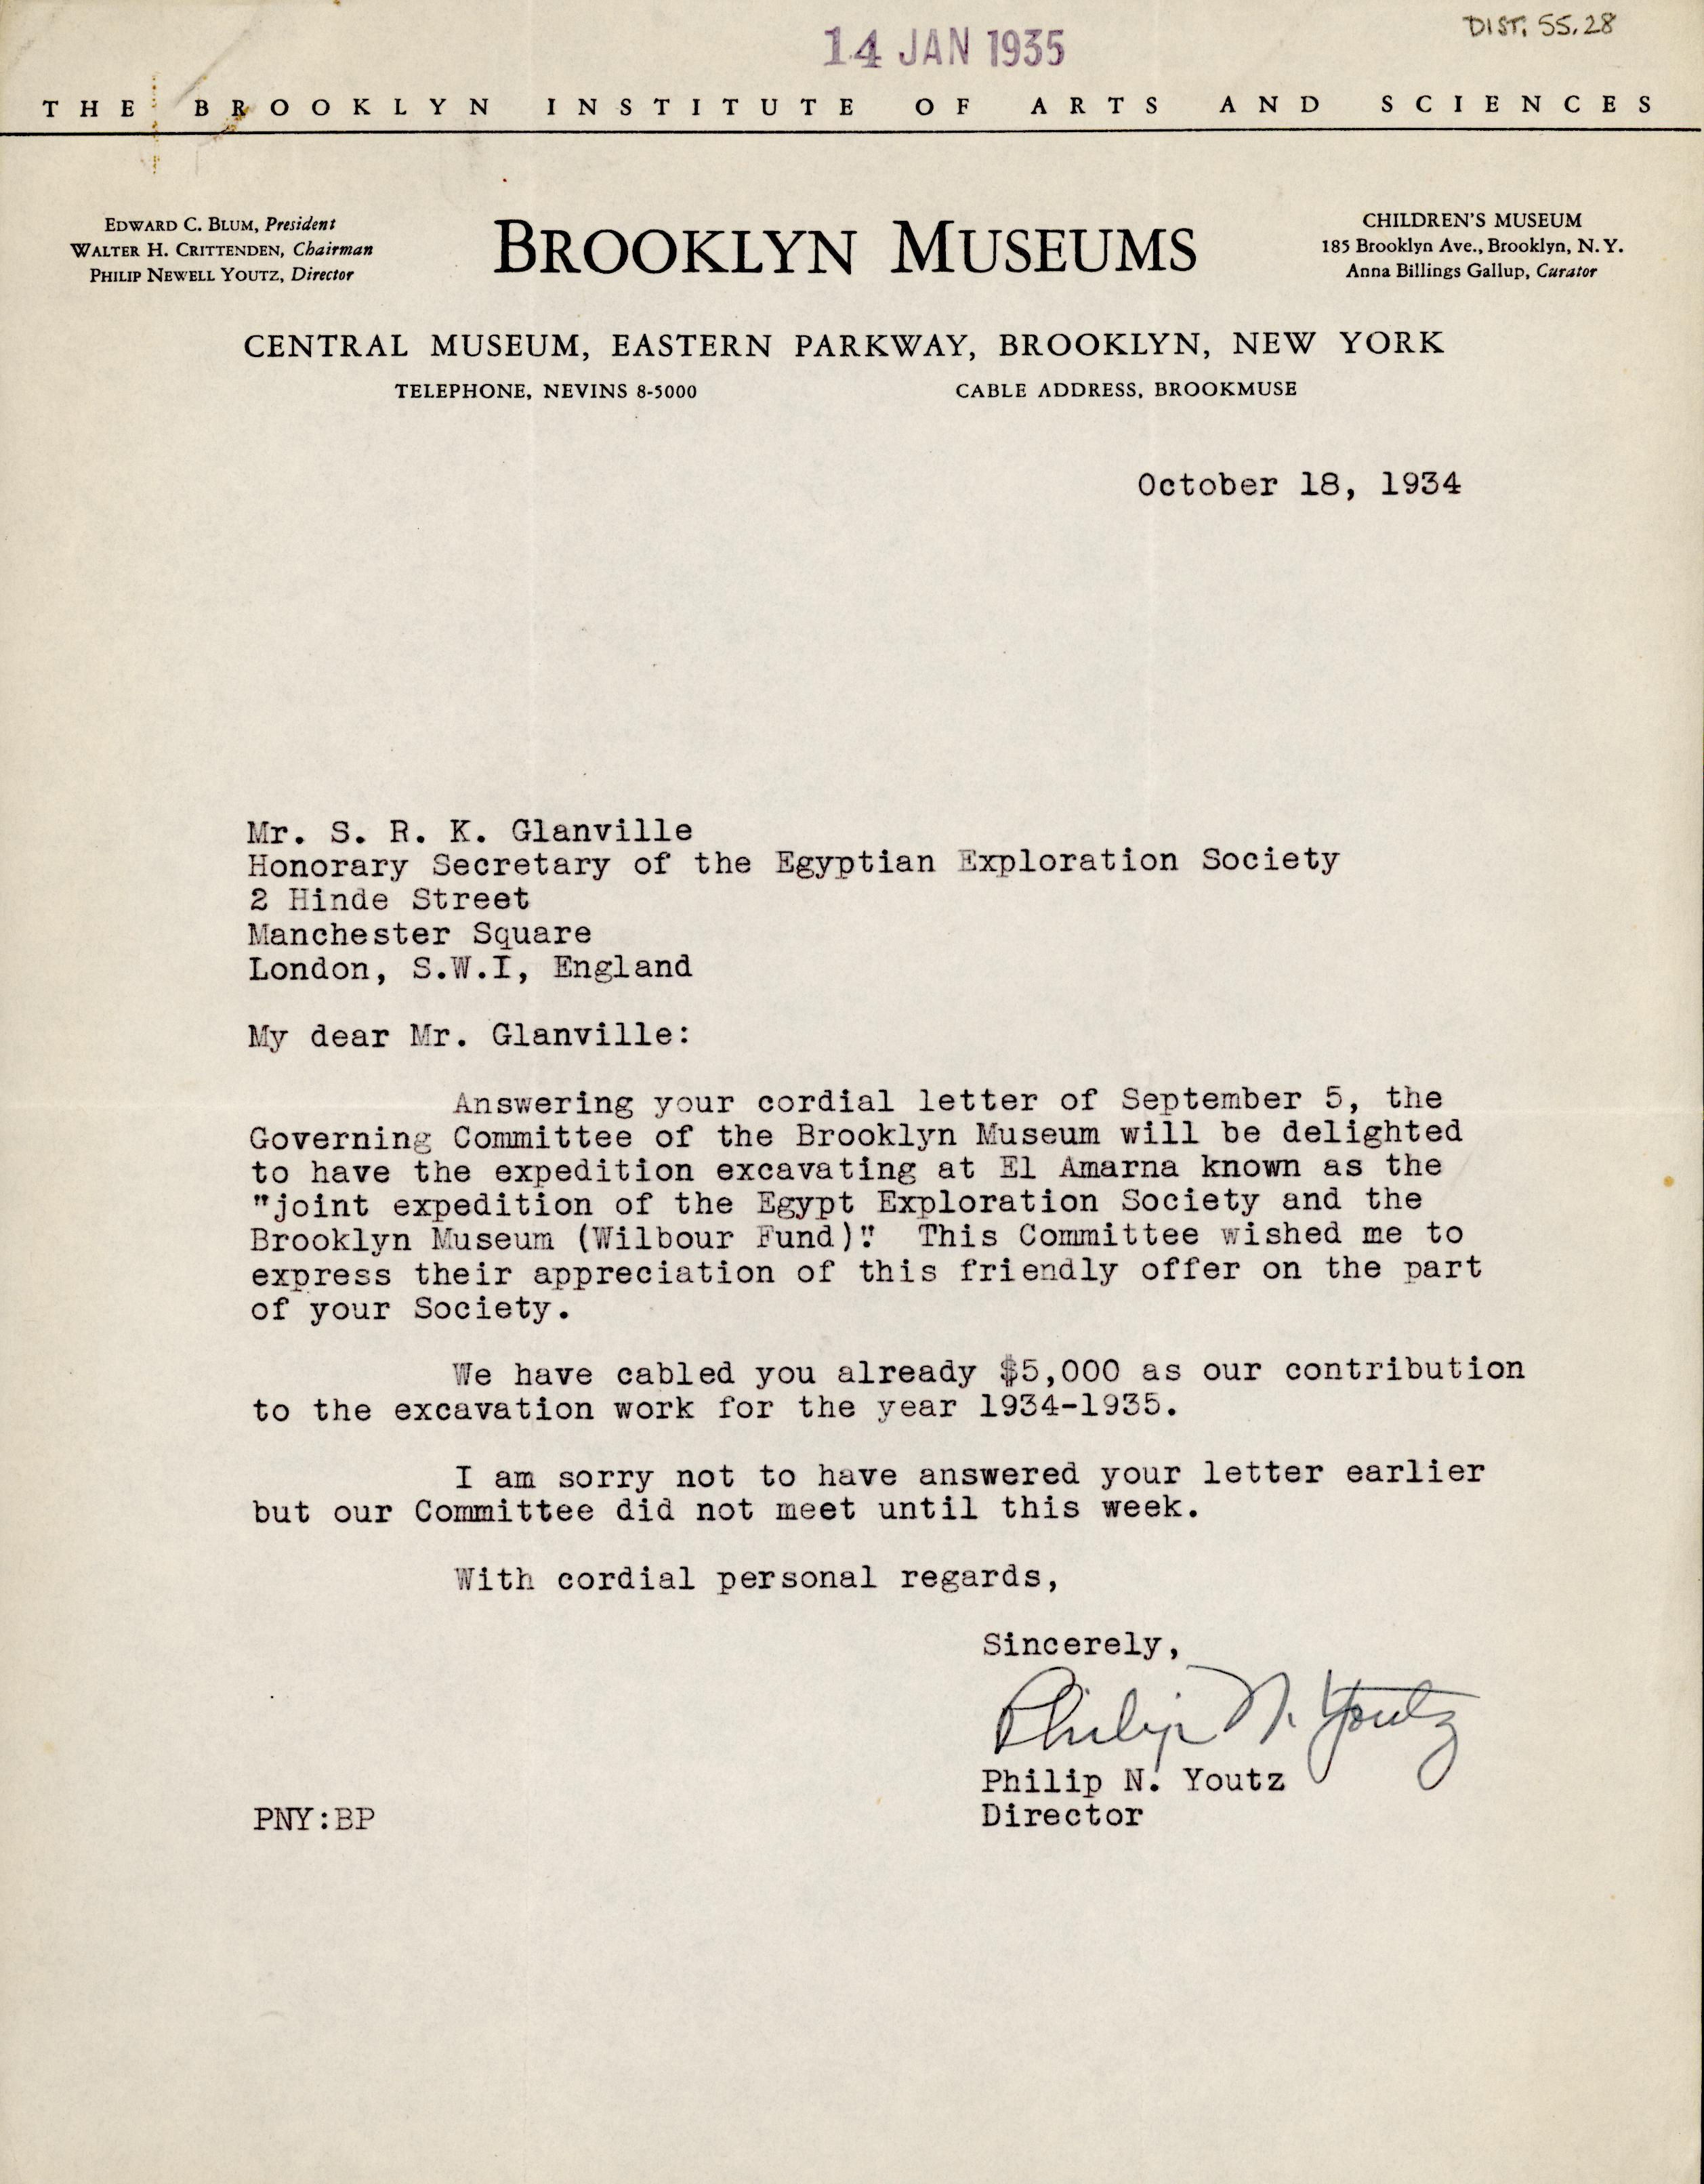 1931-44 Brooklyn Museum DIST.55.28a